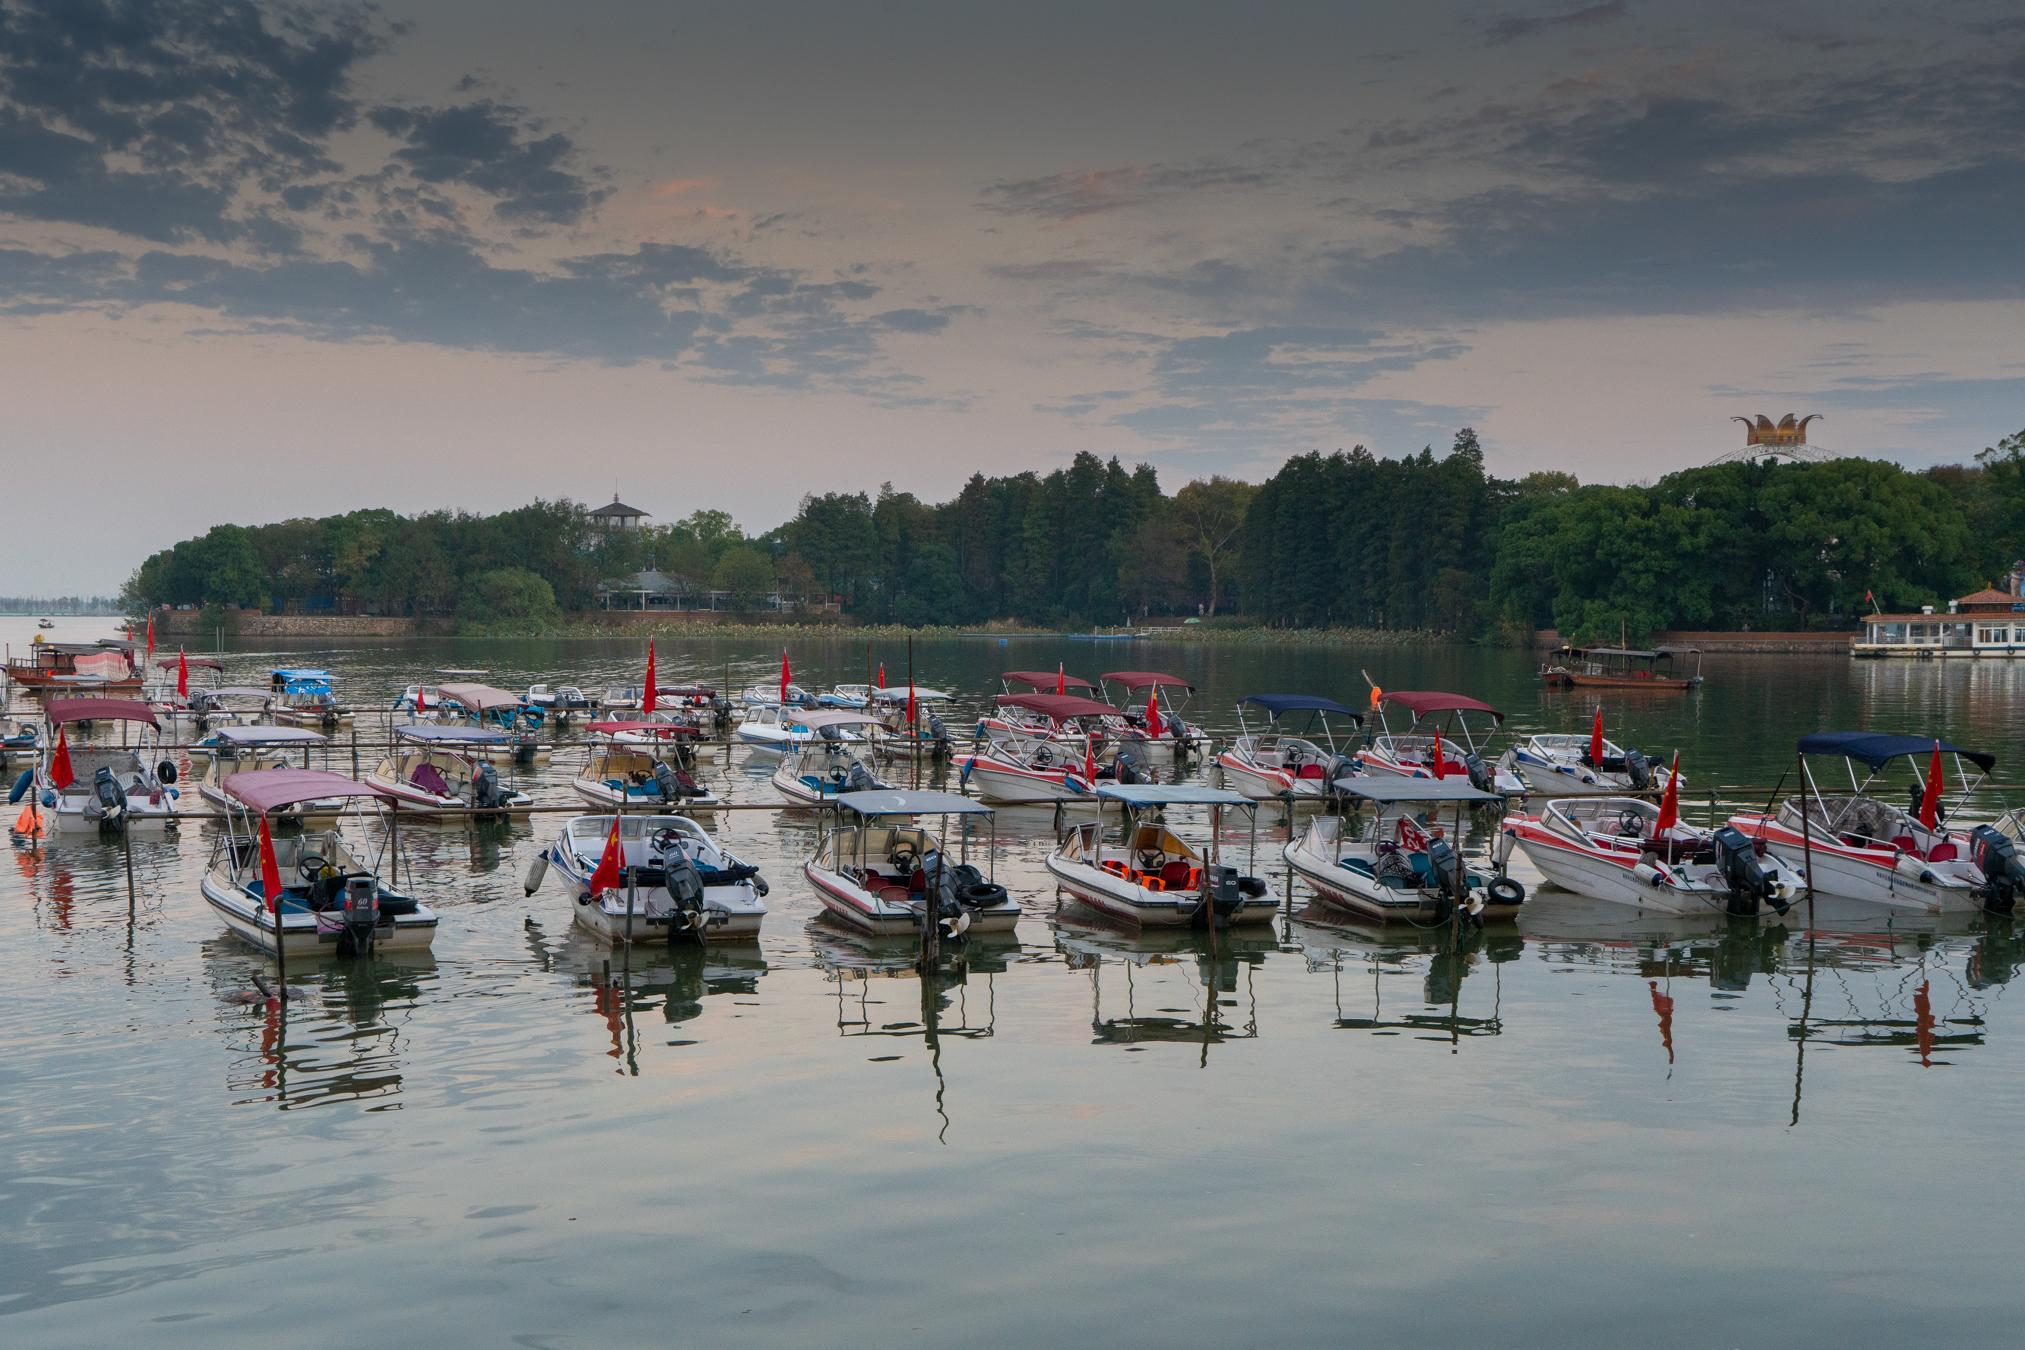 Medium_Wachang Moshan Park-boats.jpg